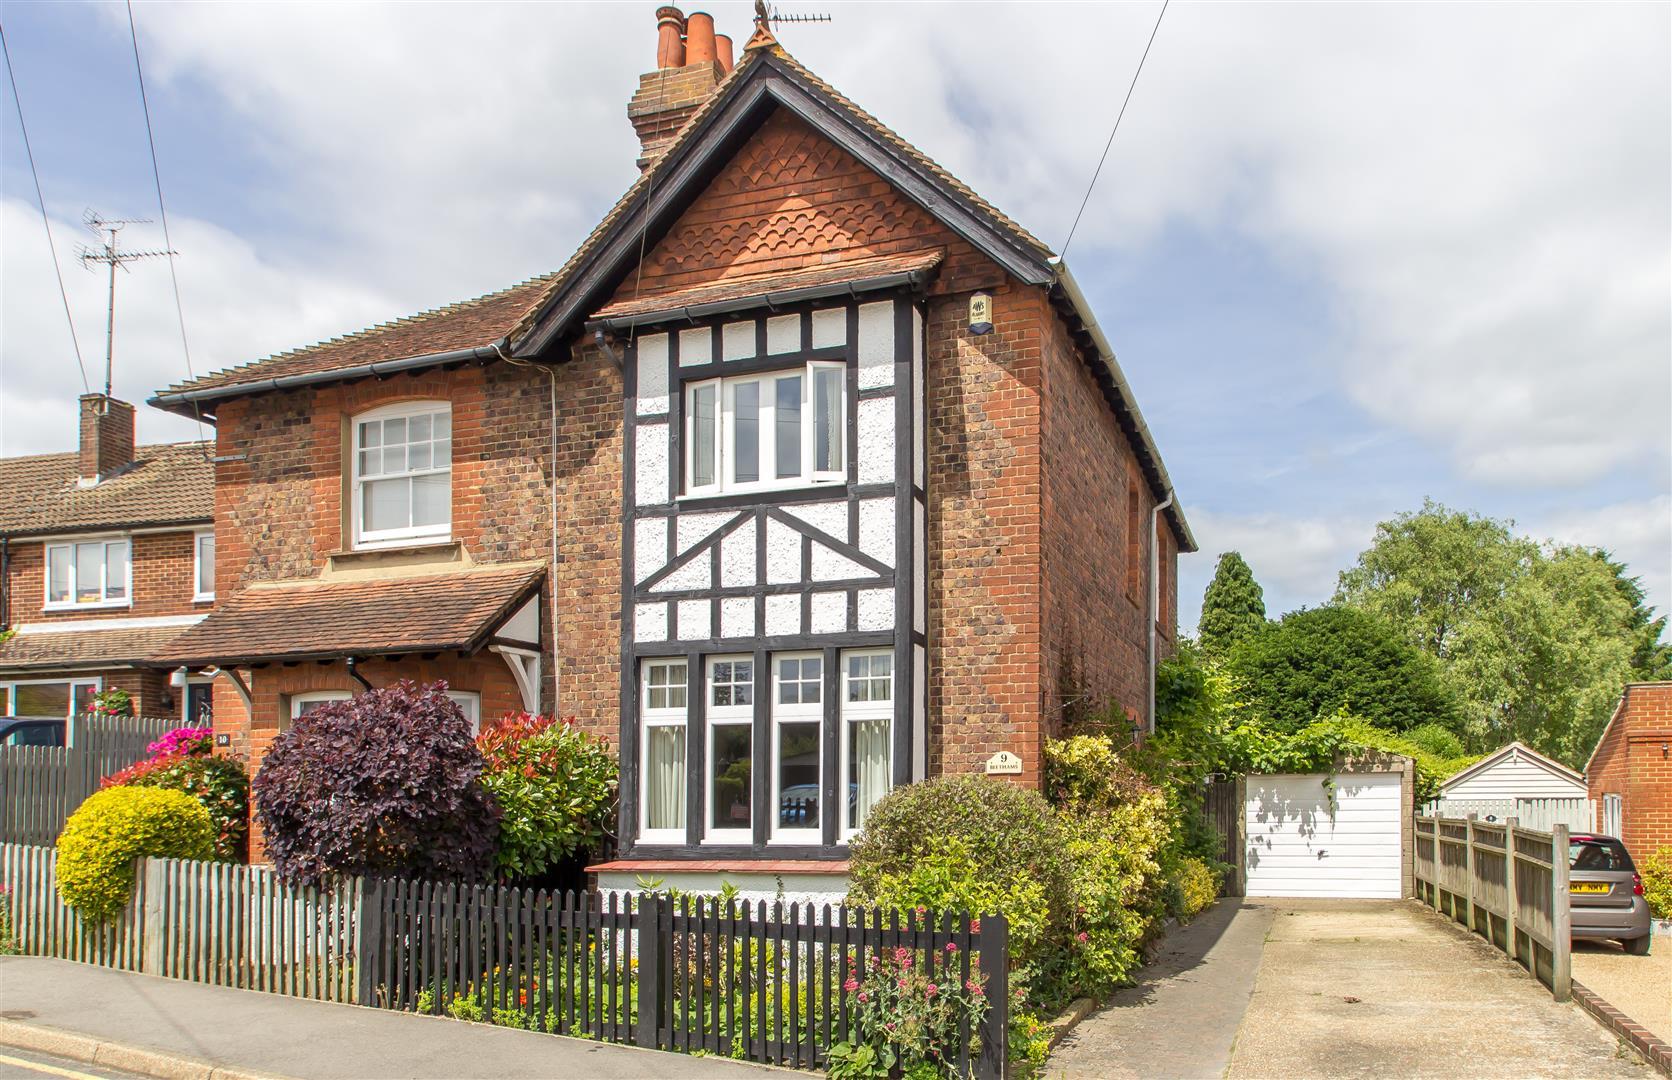 3 Bedrooms Property for sale in Westbury Terrace, Westerham